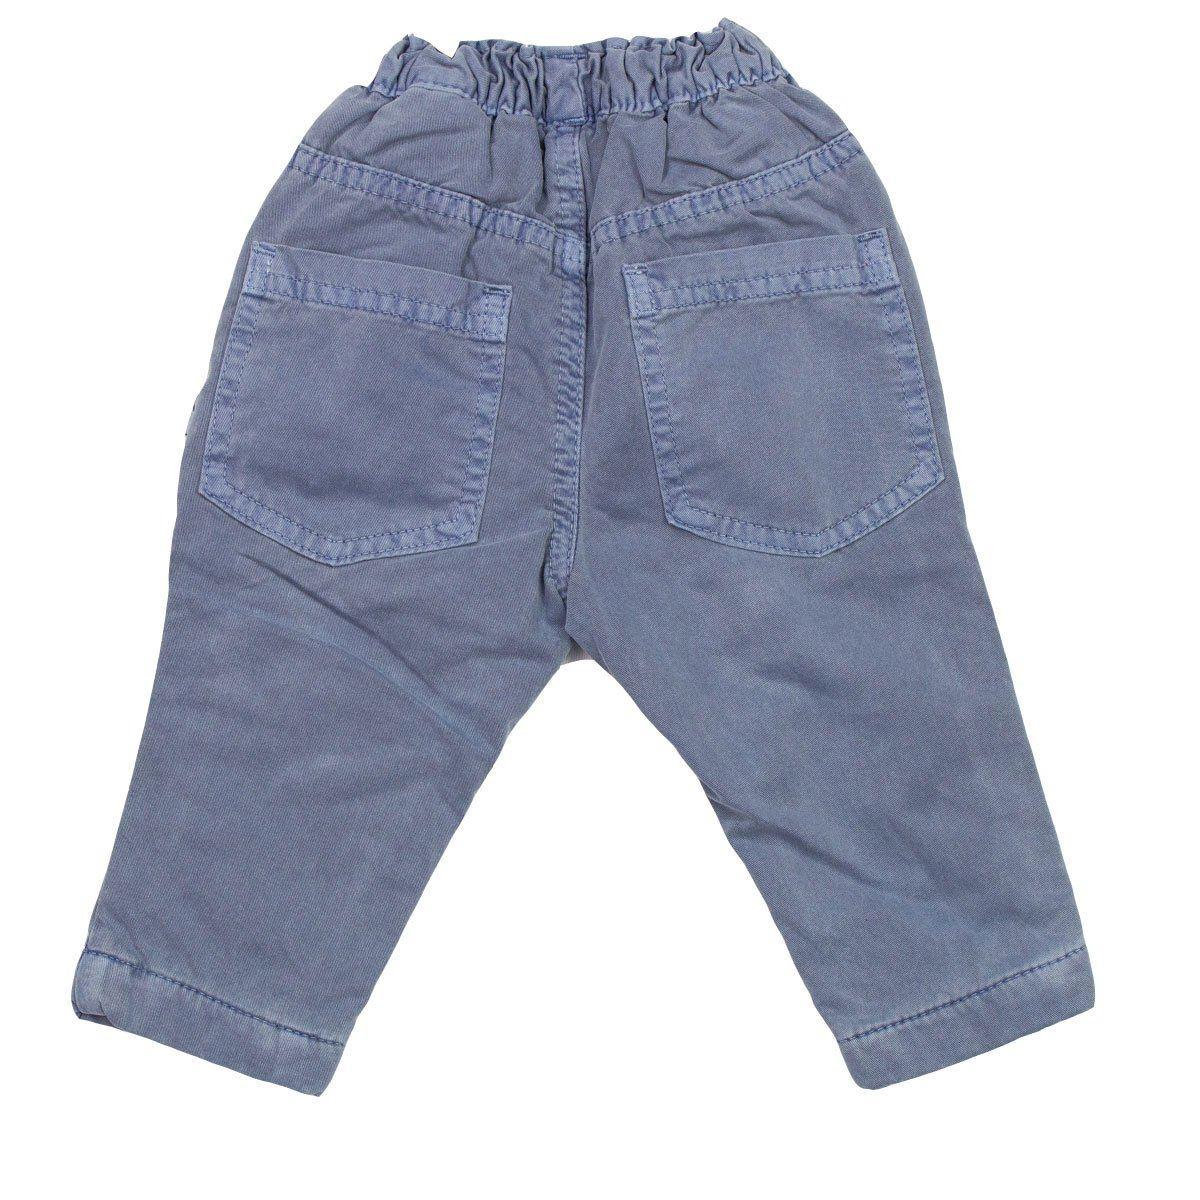 c6cf11c01 Calça Jeans Infantil Menino Hering Kids C1caicpaxb - R$ 74,90 em ...